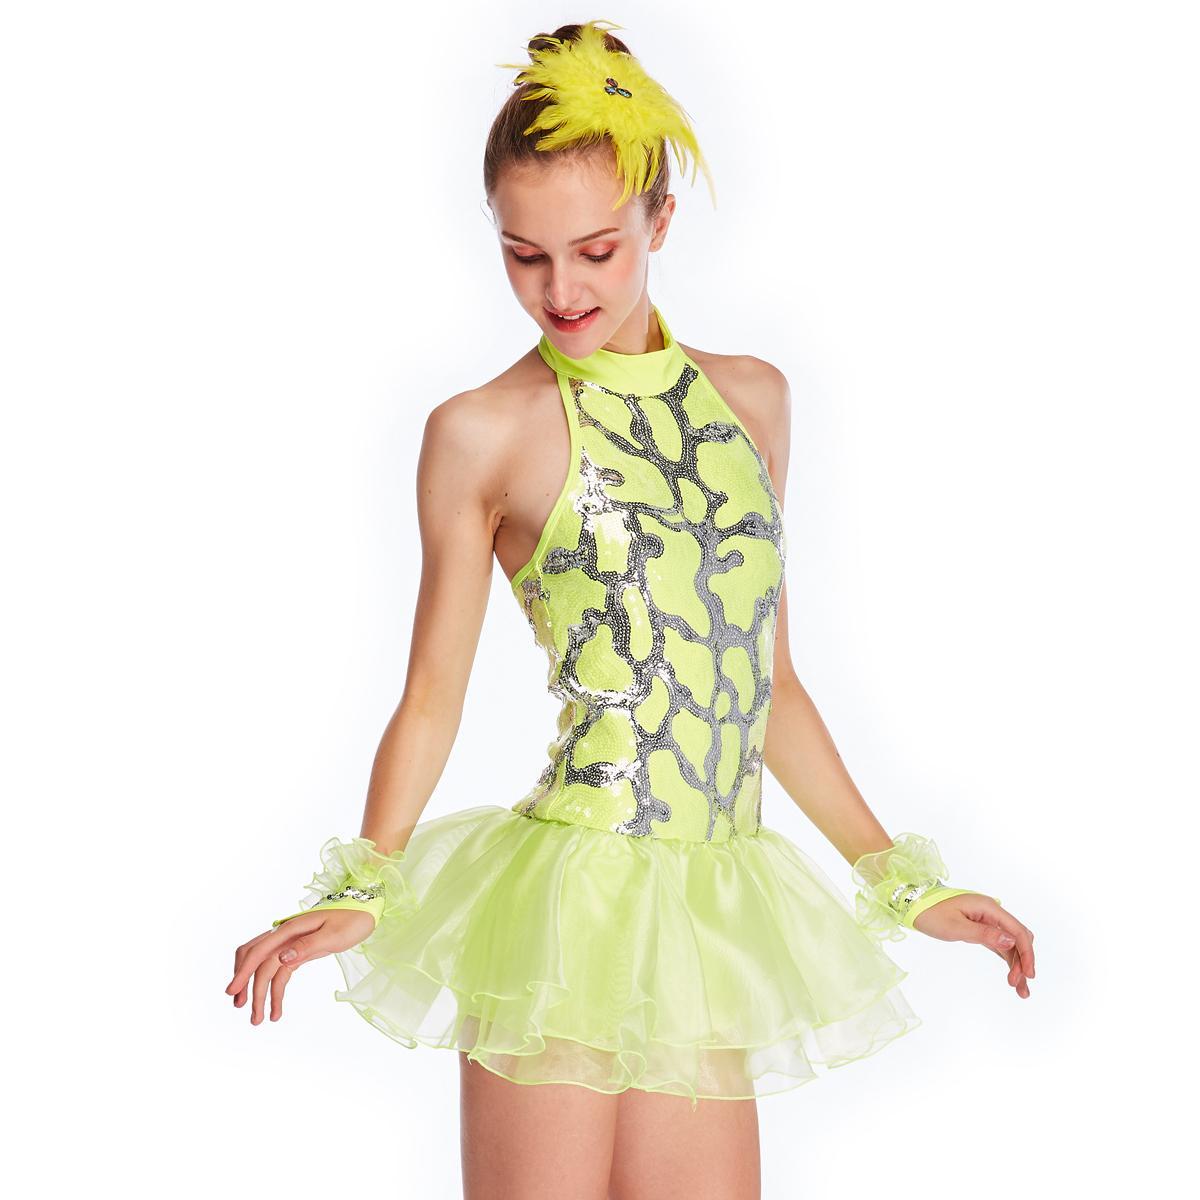 MIDEE comfortable ballet outfits factory price dance school-1